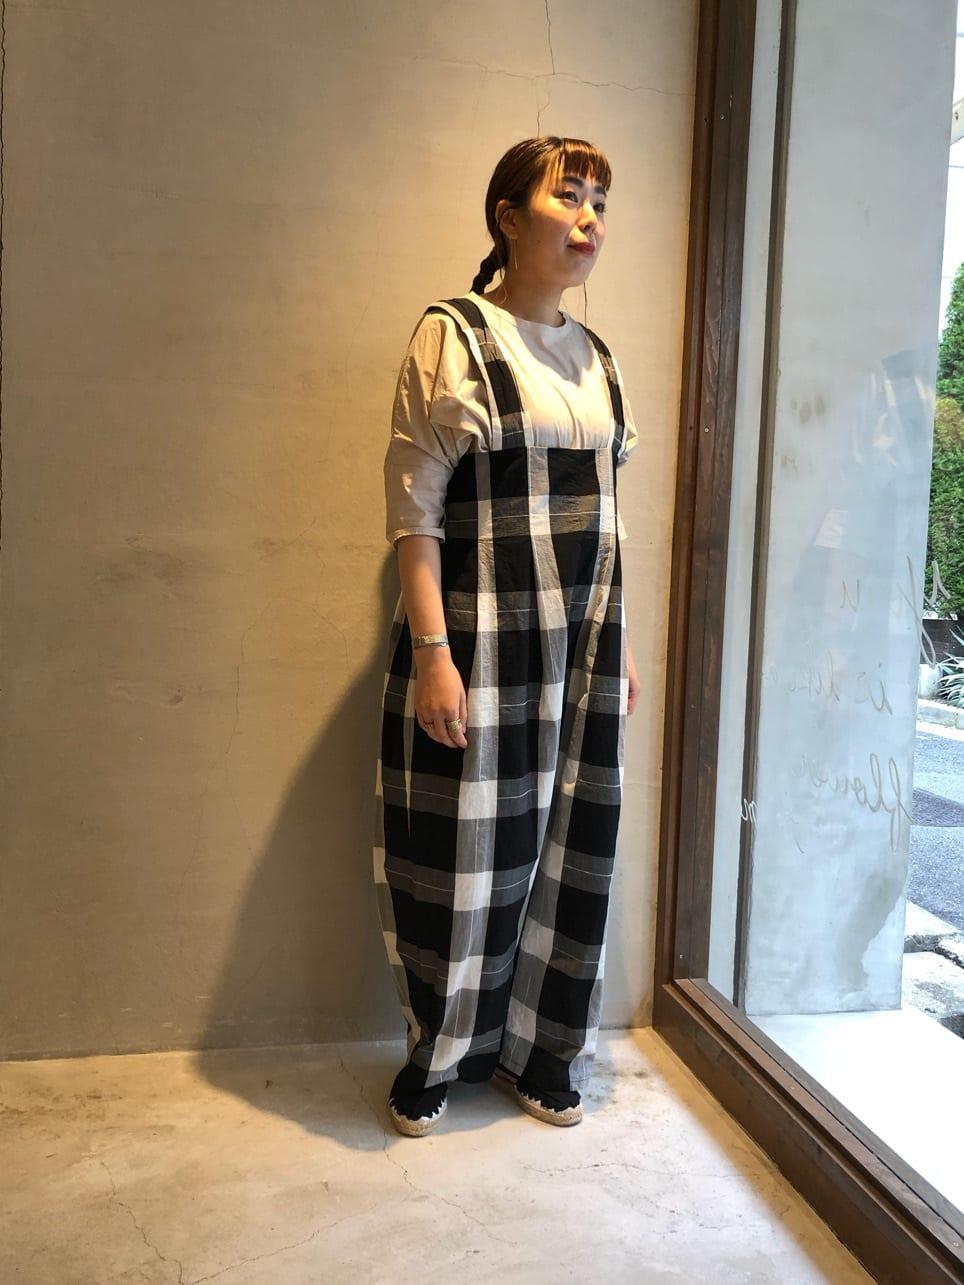 yuni 神戸路面 身長:154cm 2021.06.17